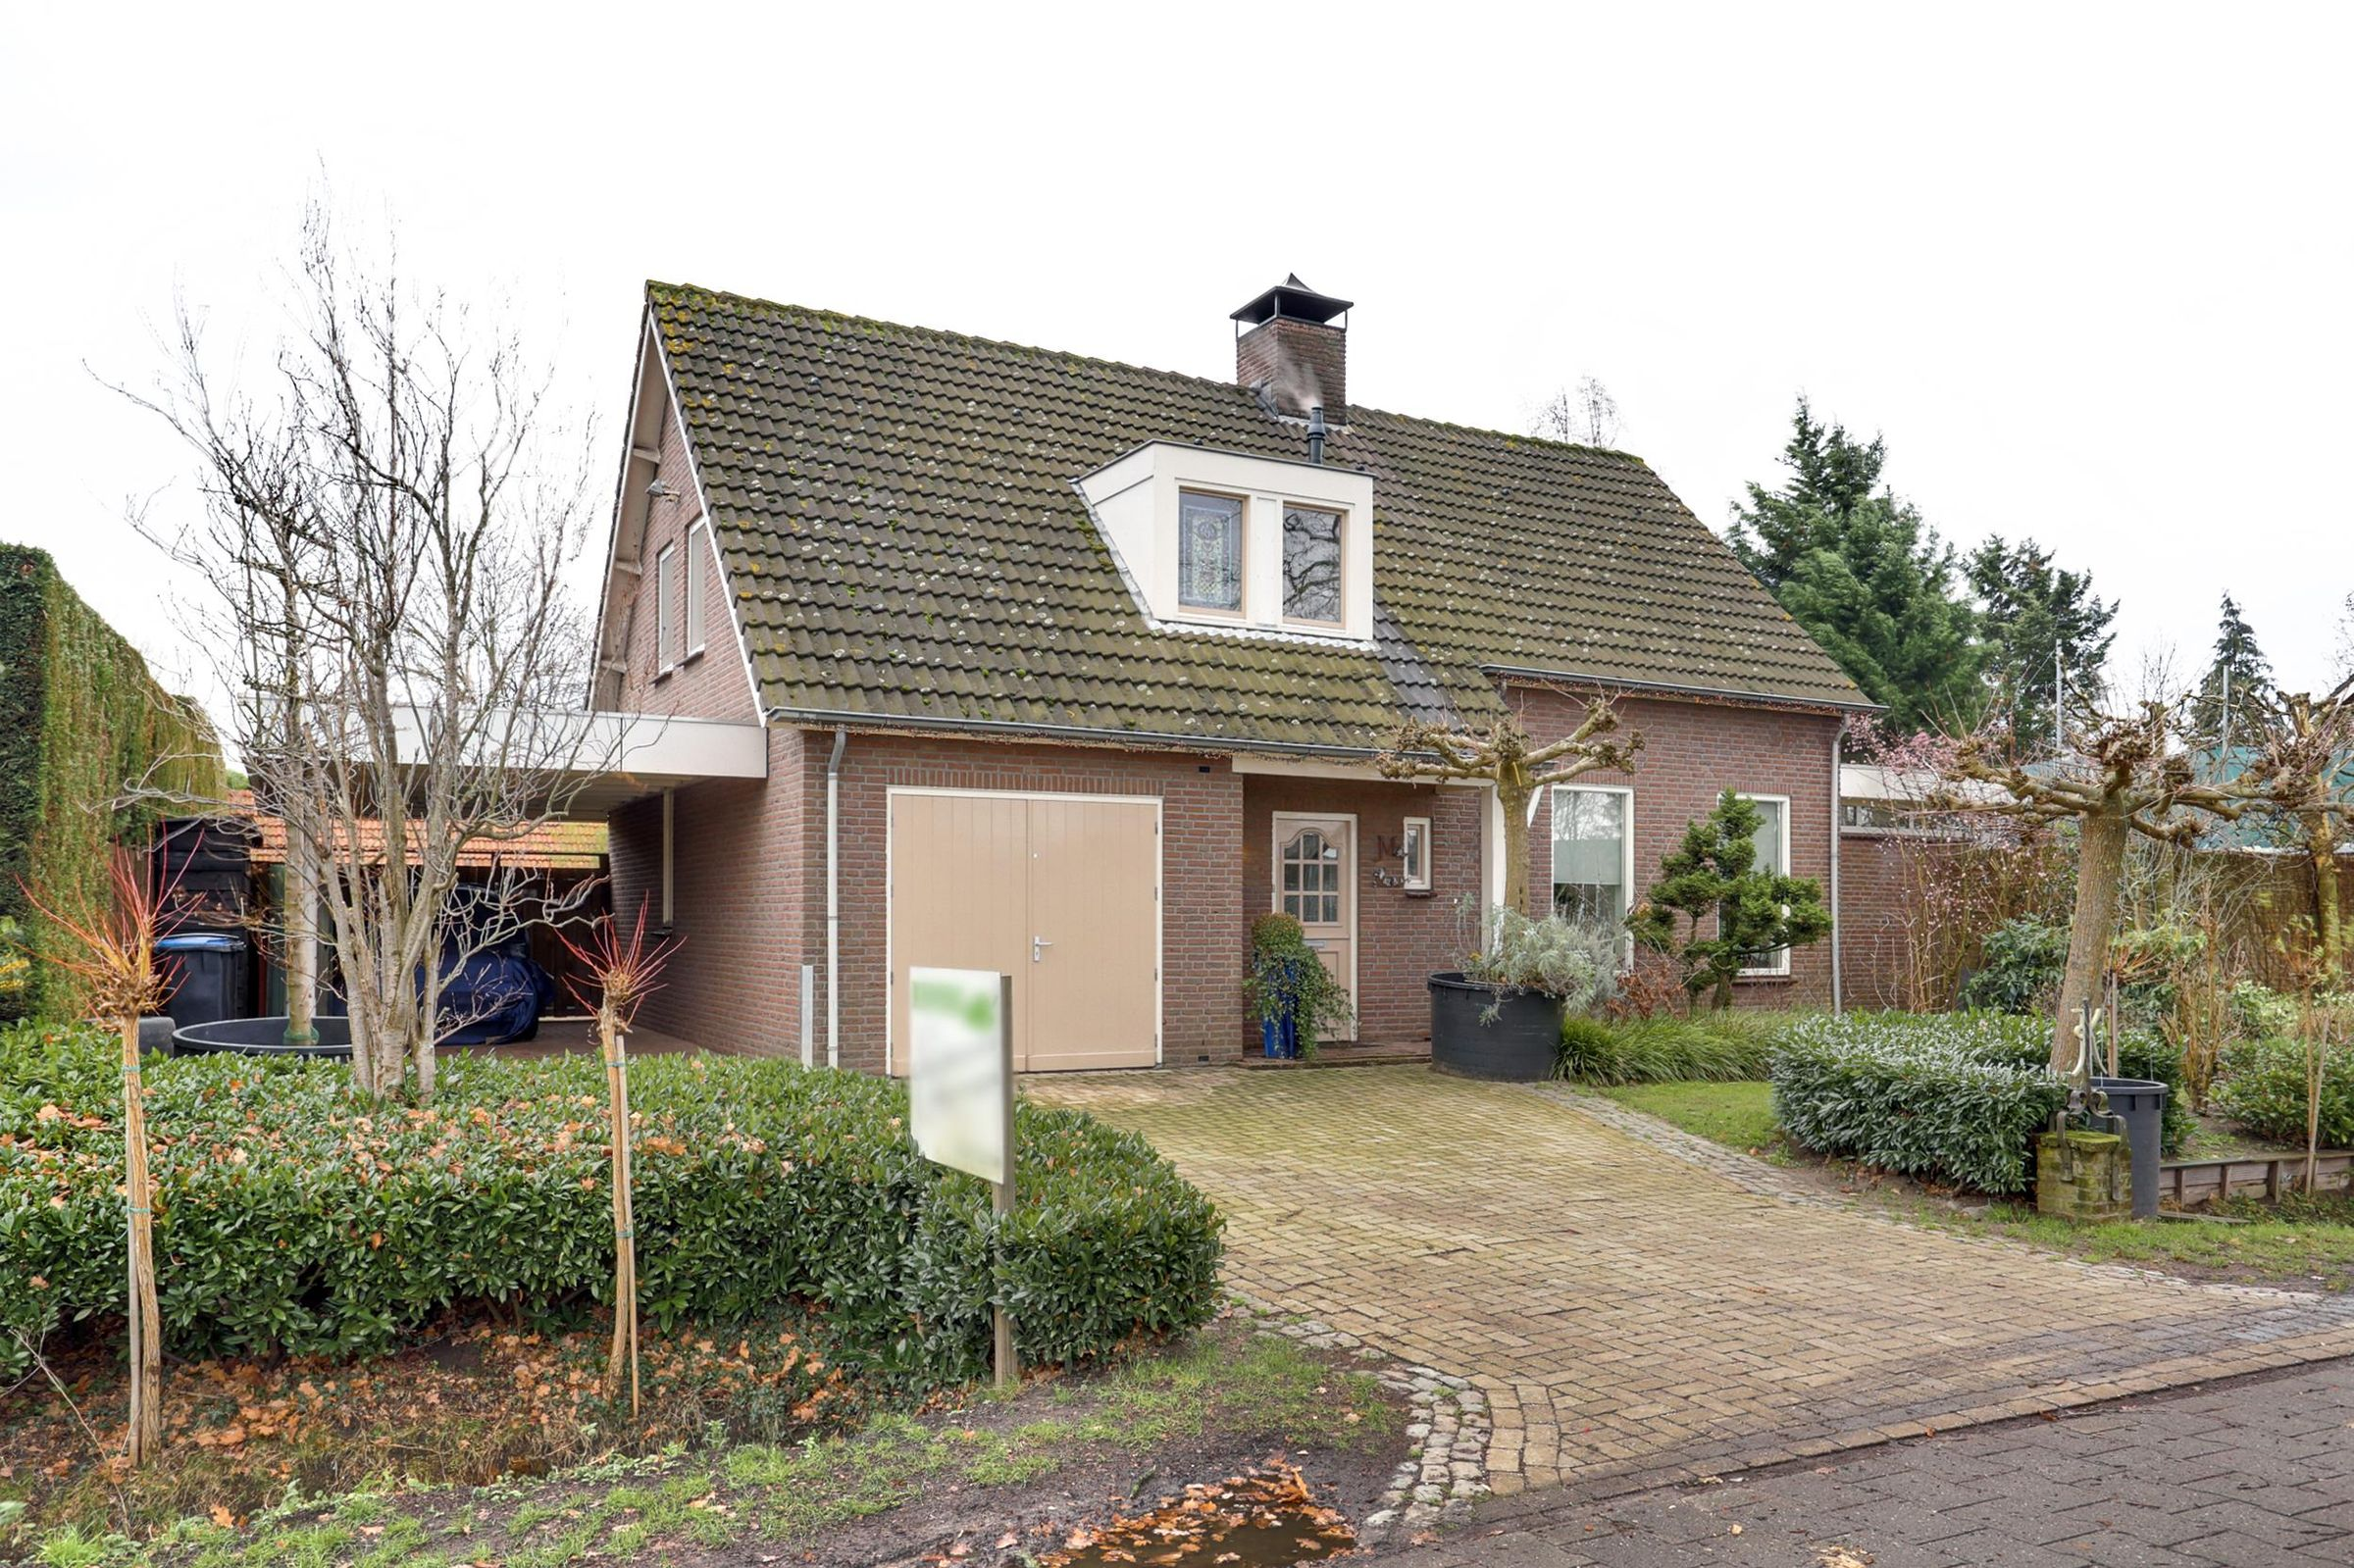 Haarenseweg 42, Oisterwijk